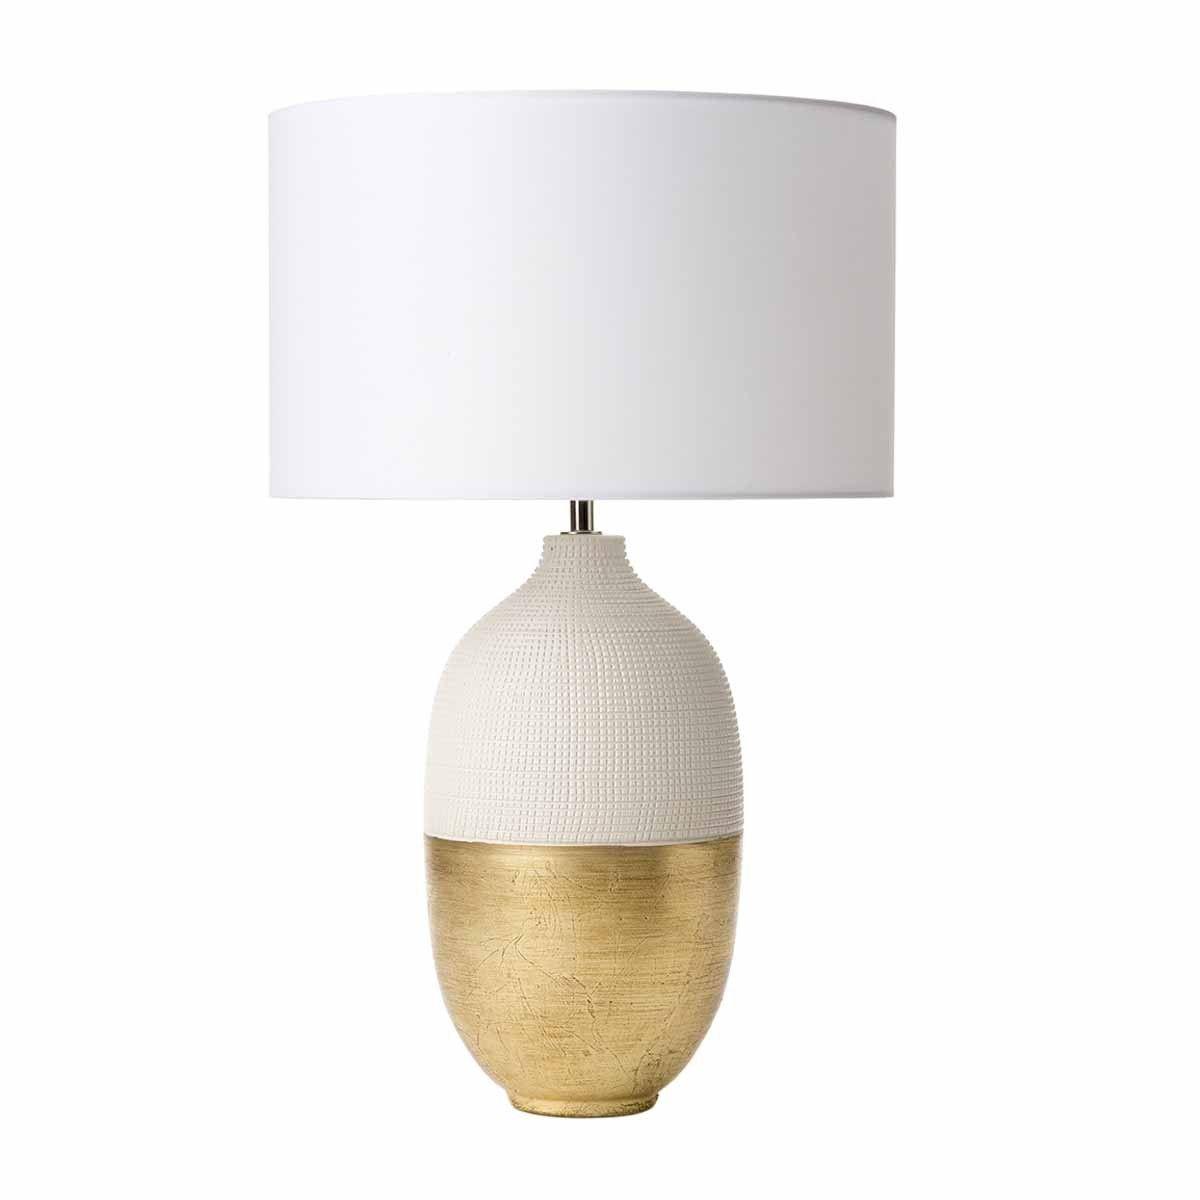 Siya Table Lamp White Gold Base Only Table Lamp Base Table Lamp Wood Table Lamp